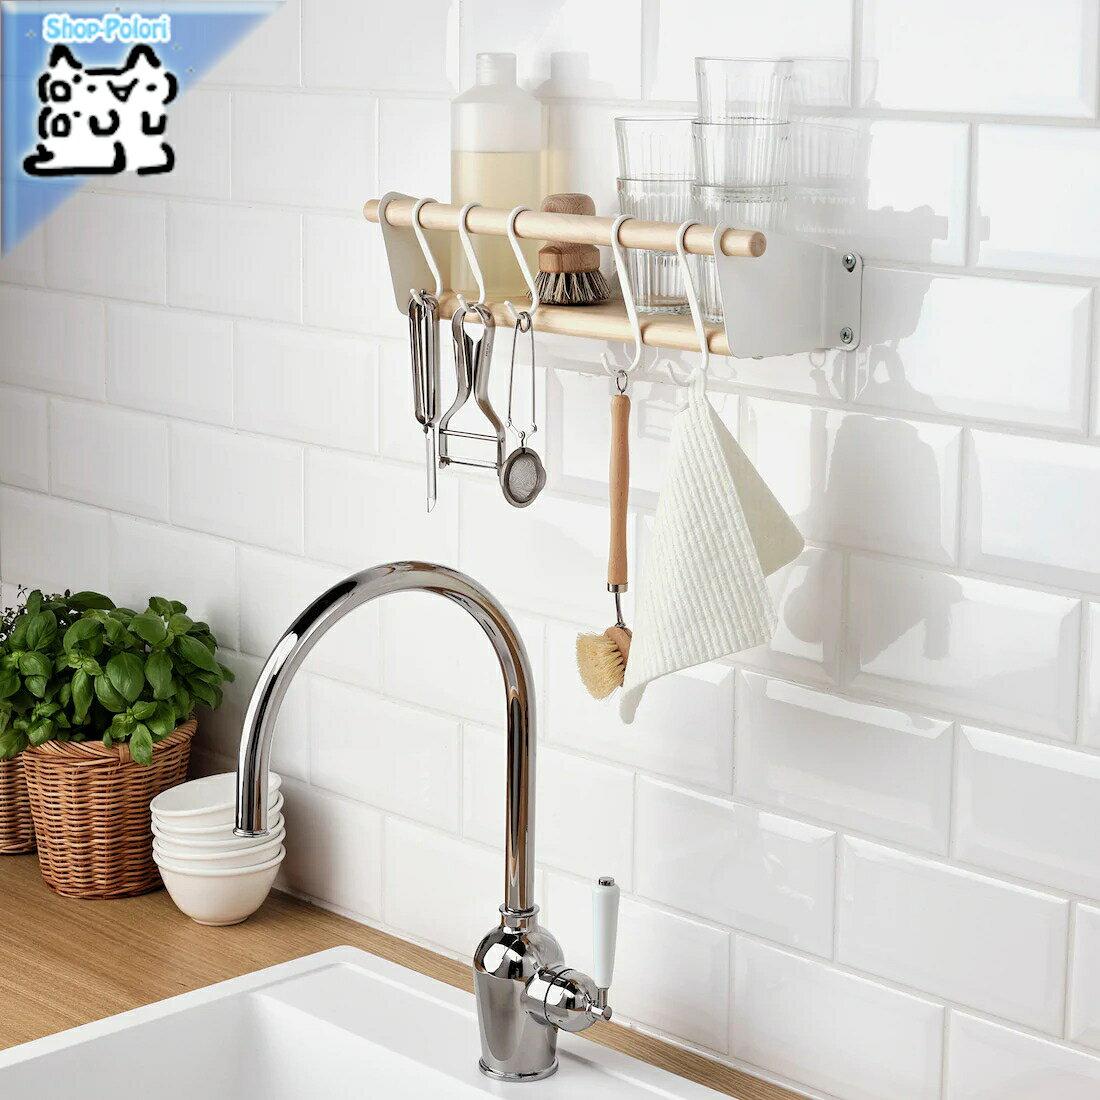 【IKEA Original】NEREBY -ネレビ- ウォールシェルフ バーチ 40x10 cm